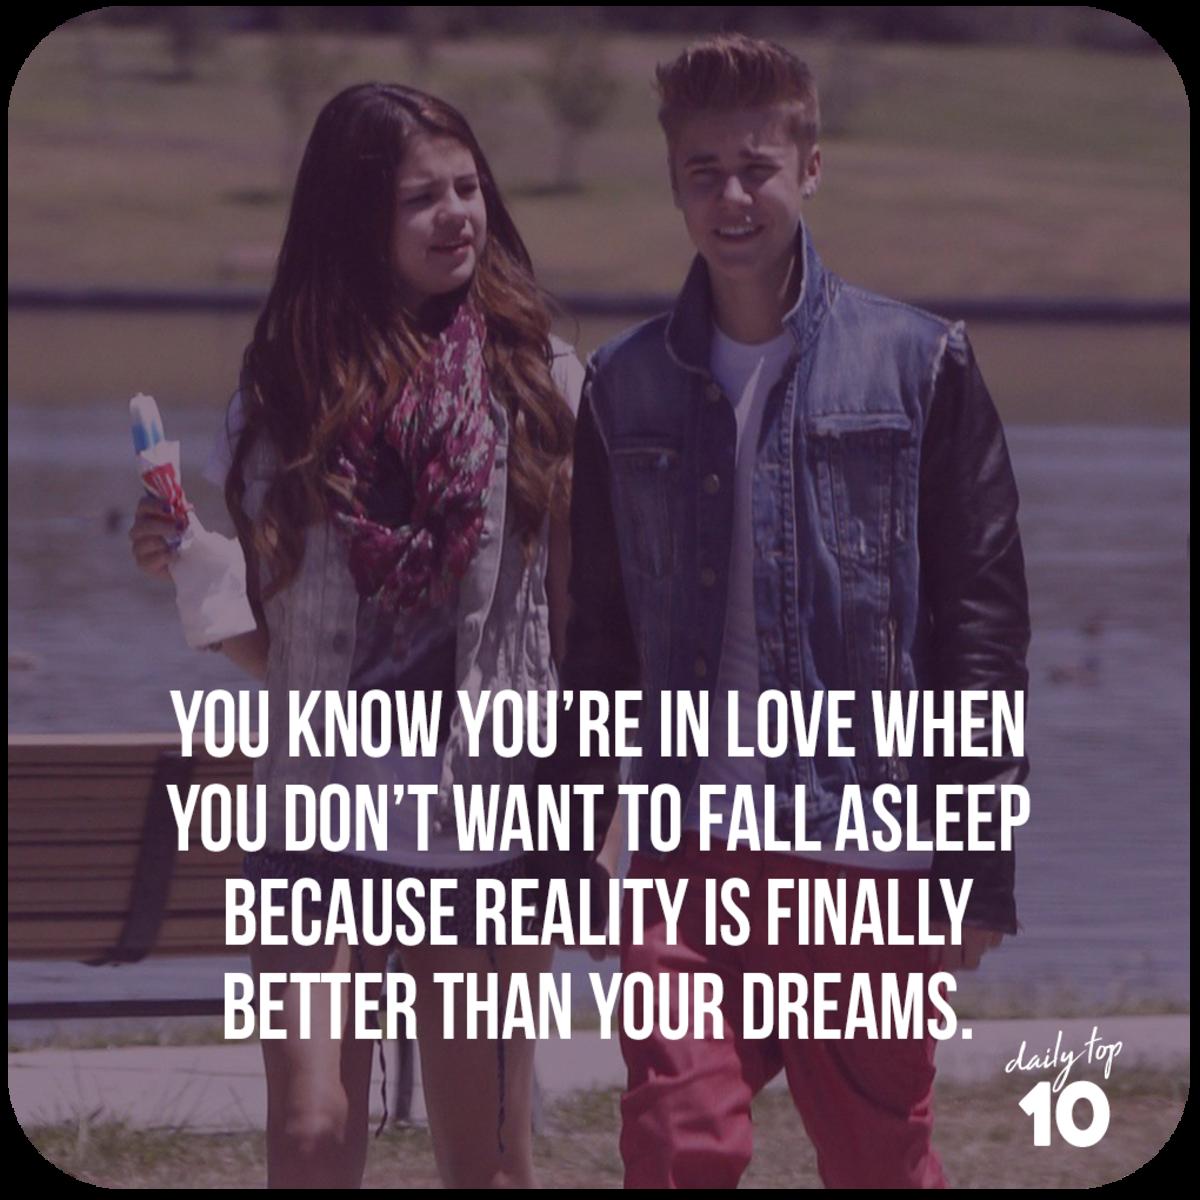 Justin Bieber and Selena Gomez strolling